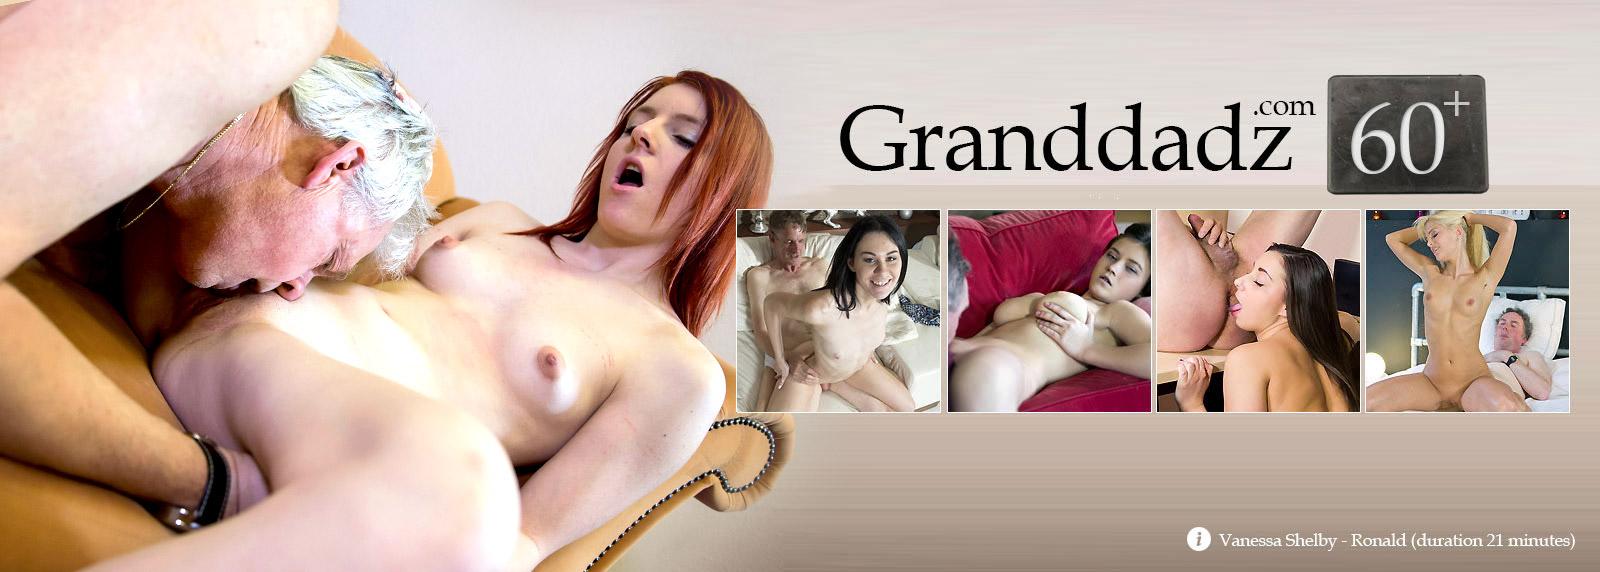 vanessa shelby fucked by granddad